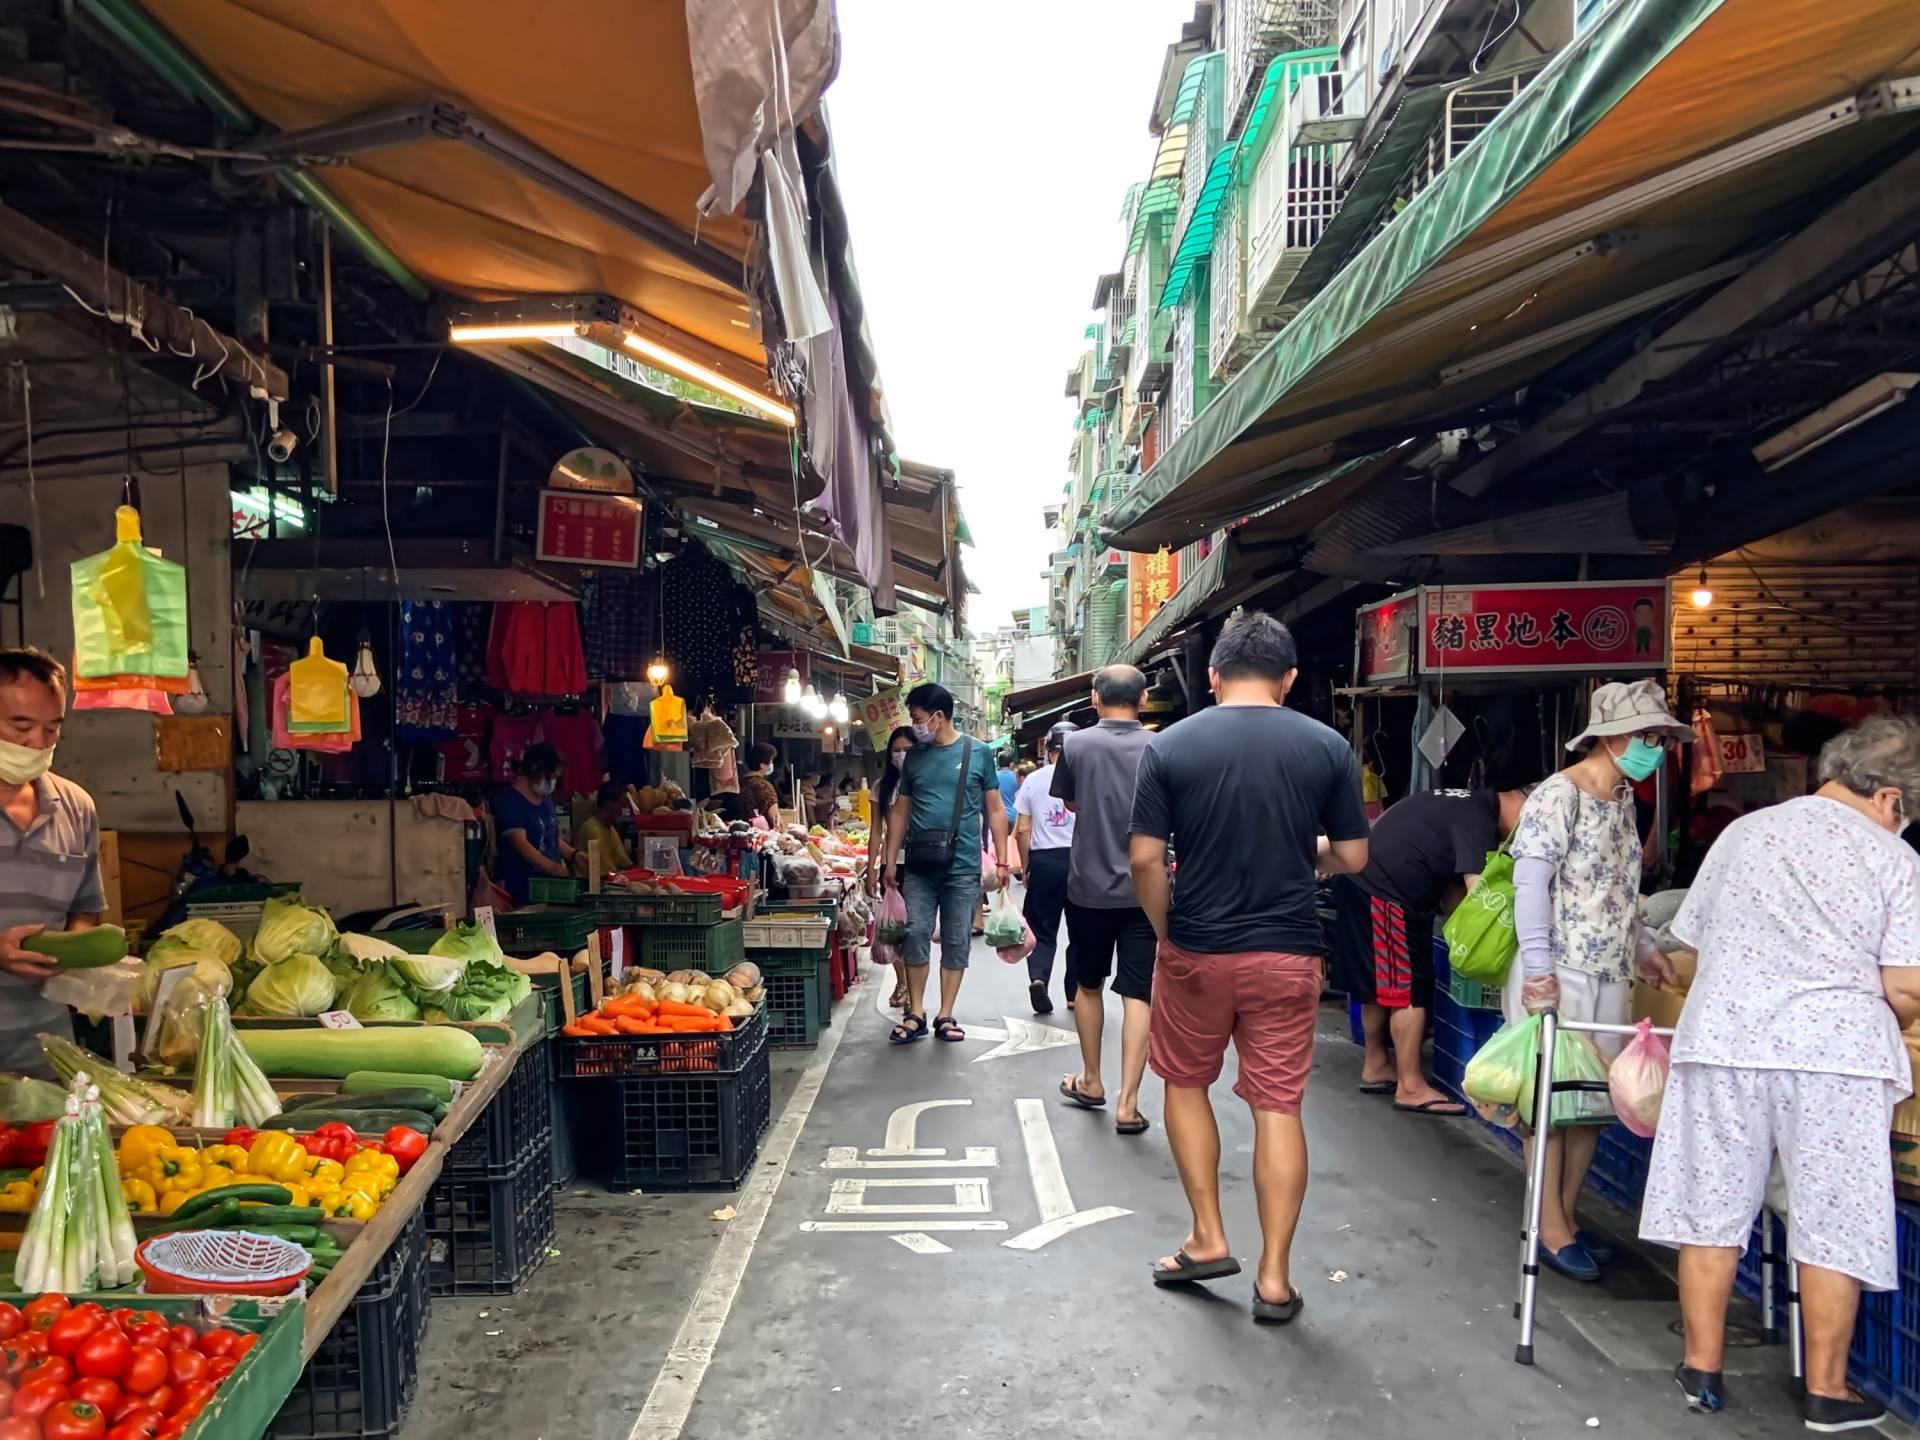 People walk through a wet market in Taiwan